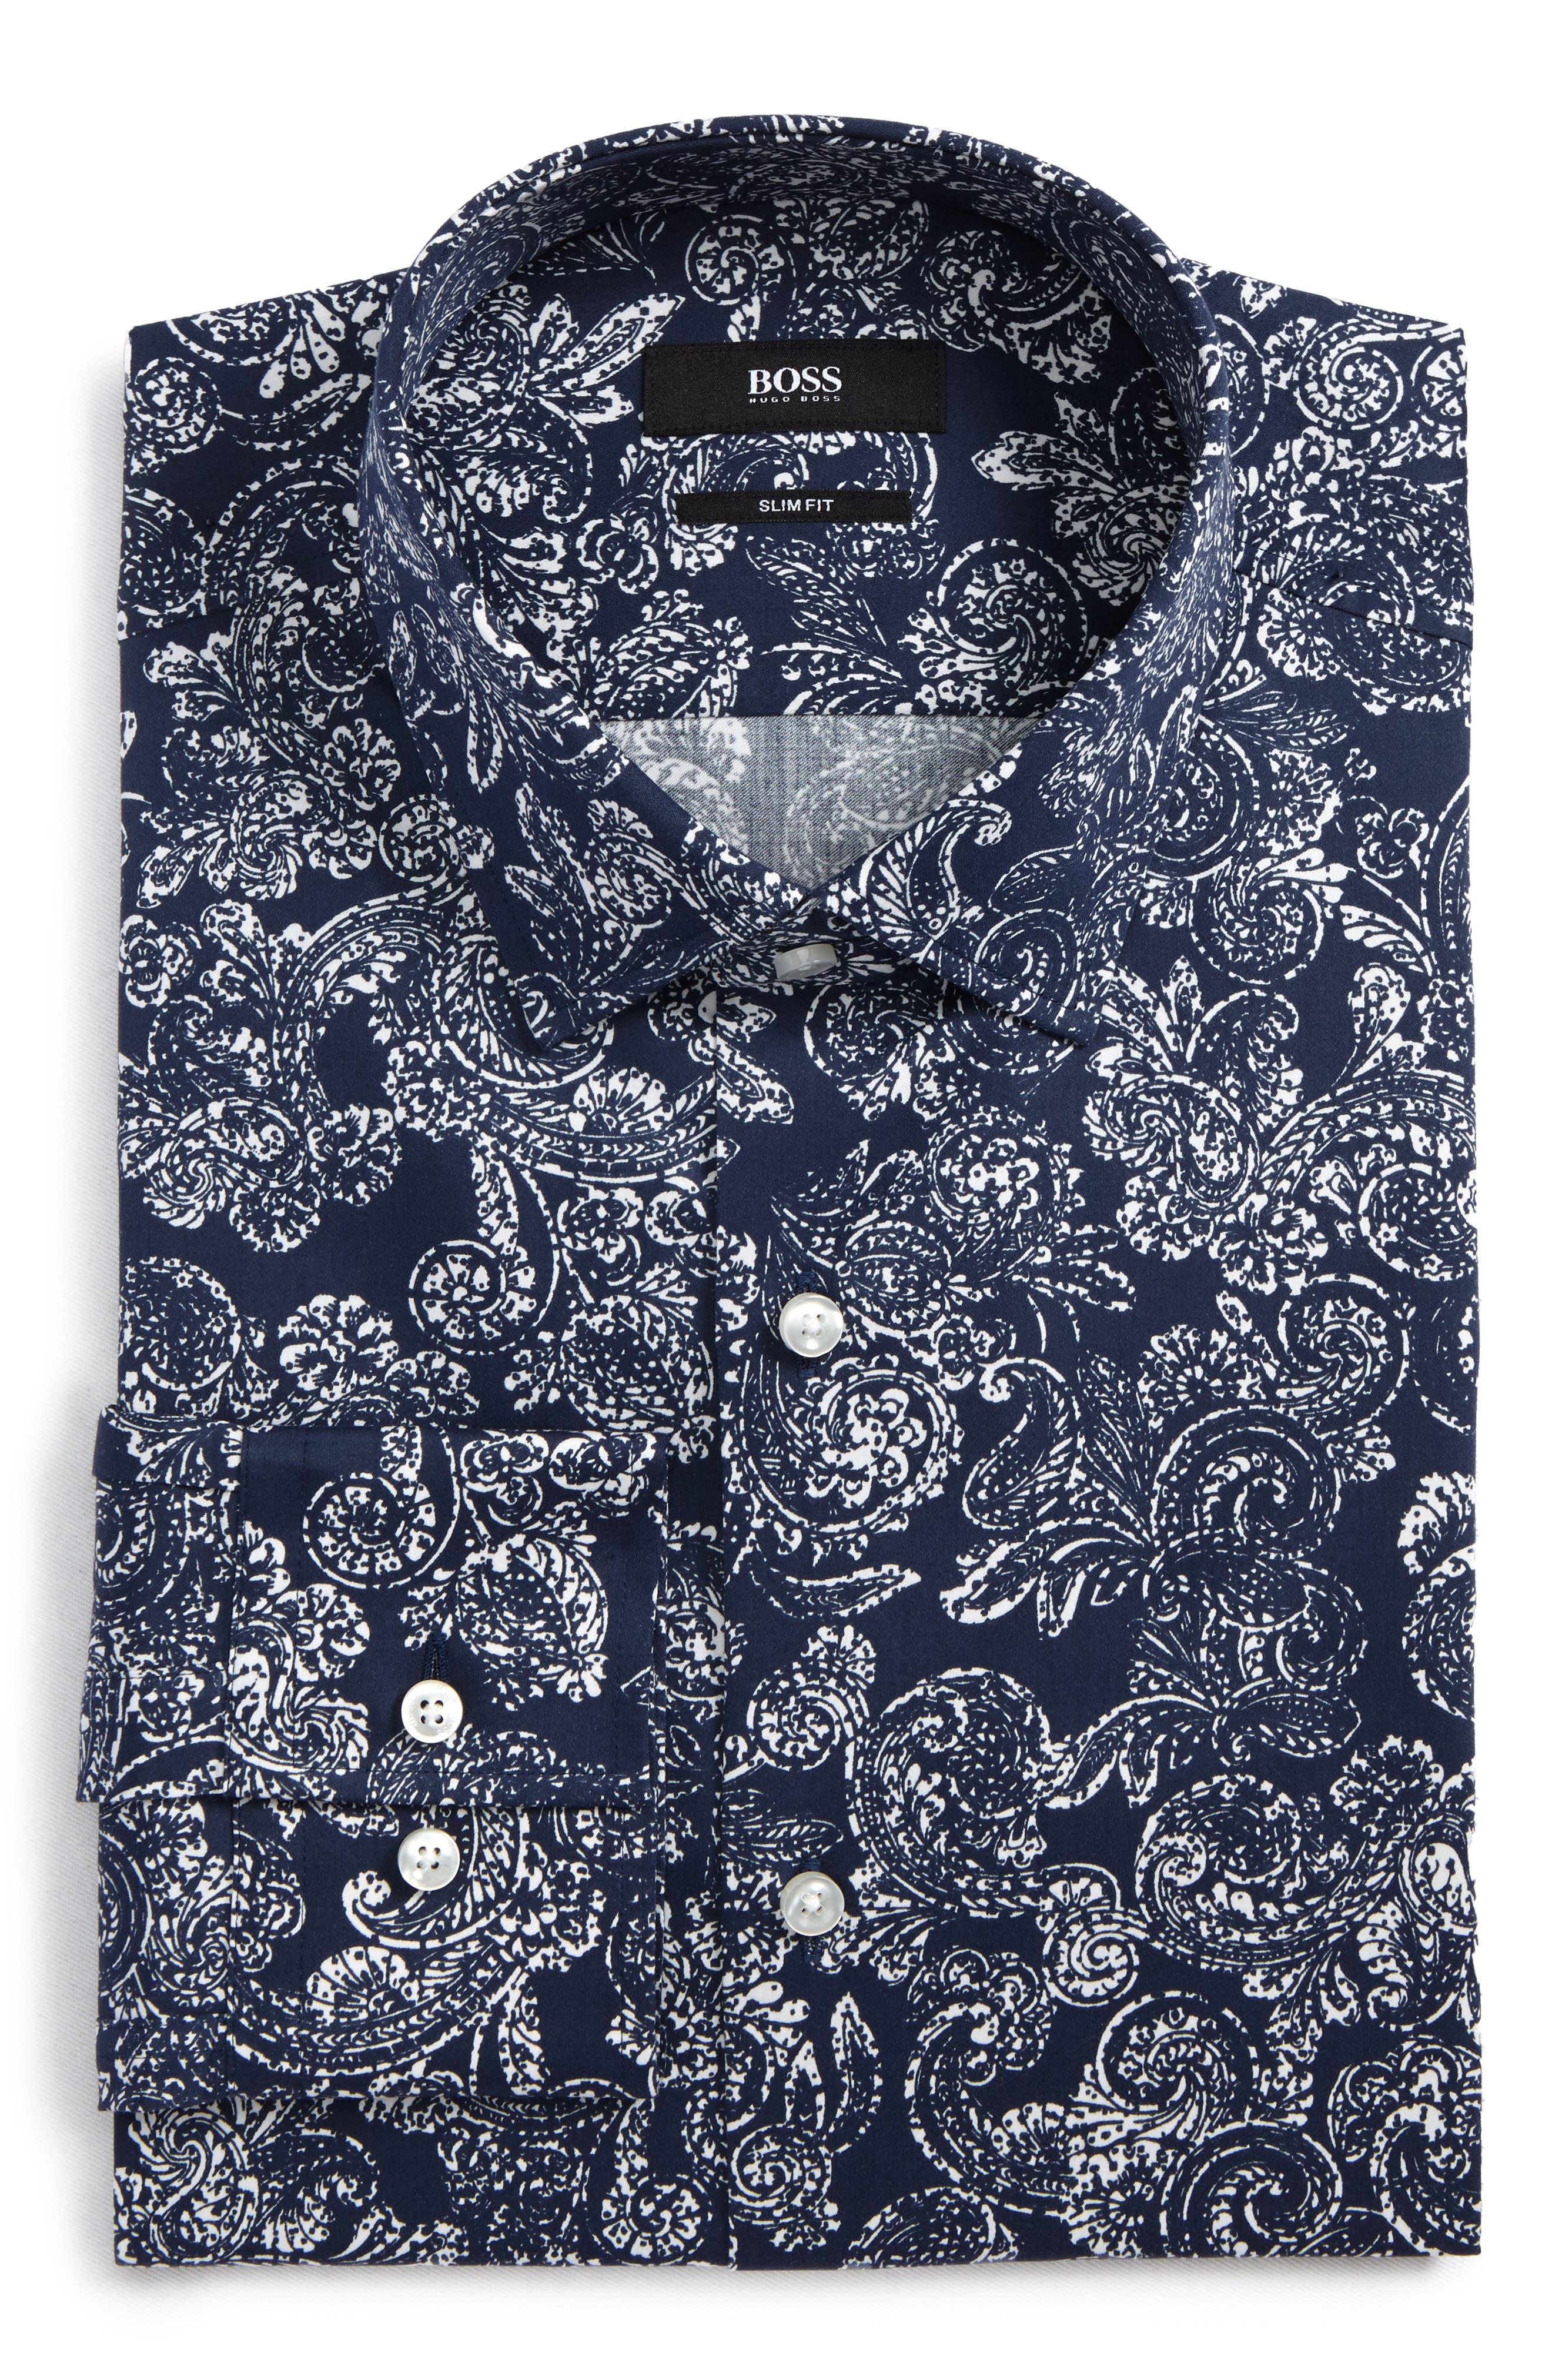 Main Image - BOSS Slim Fit Paisley Dress Shirt